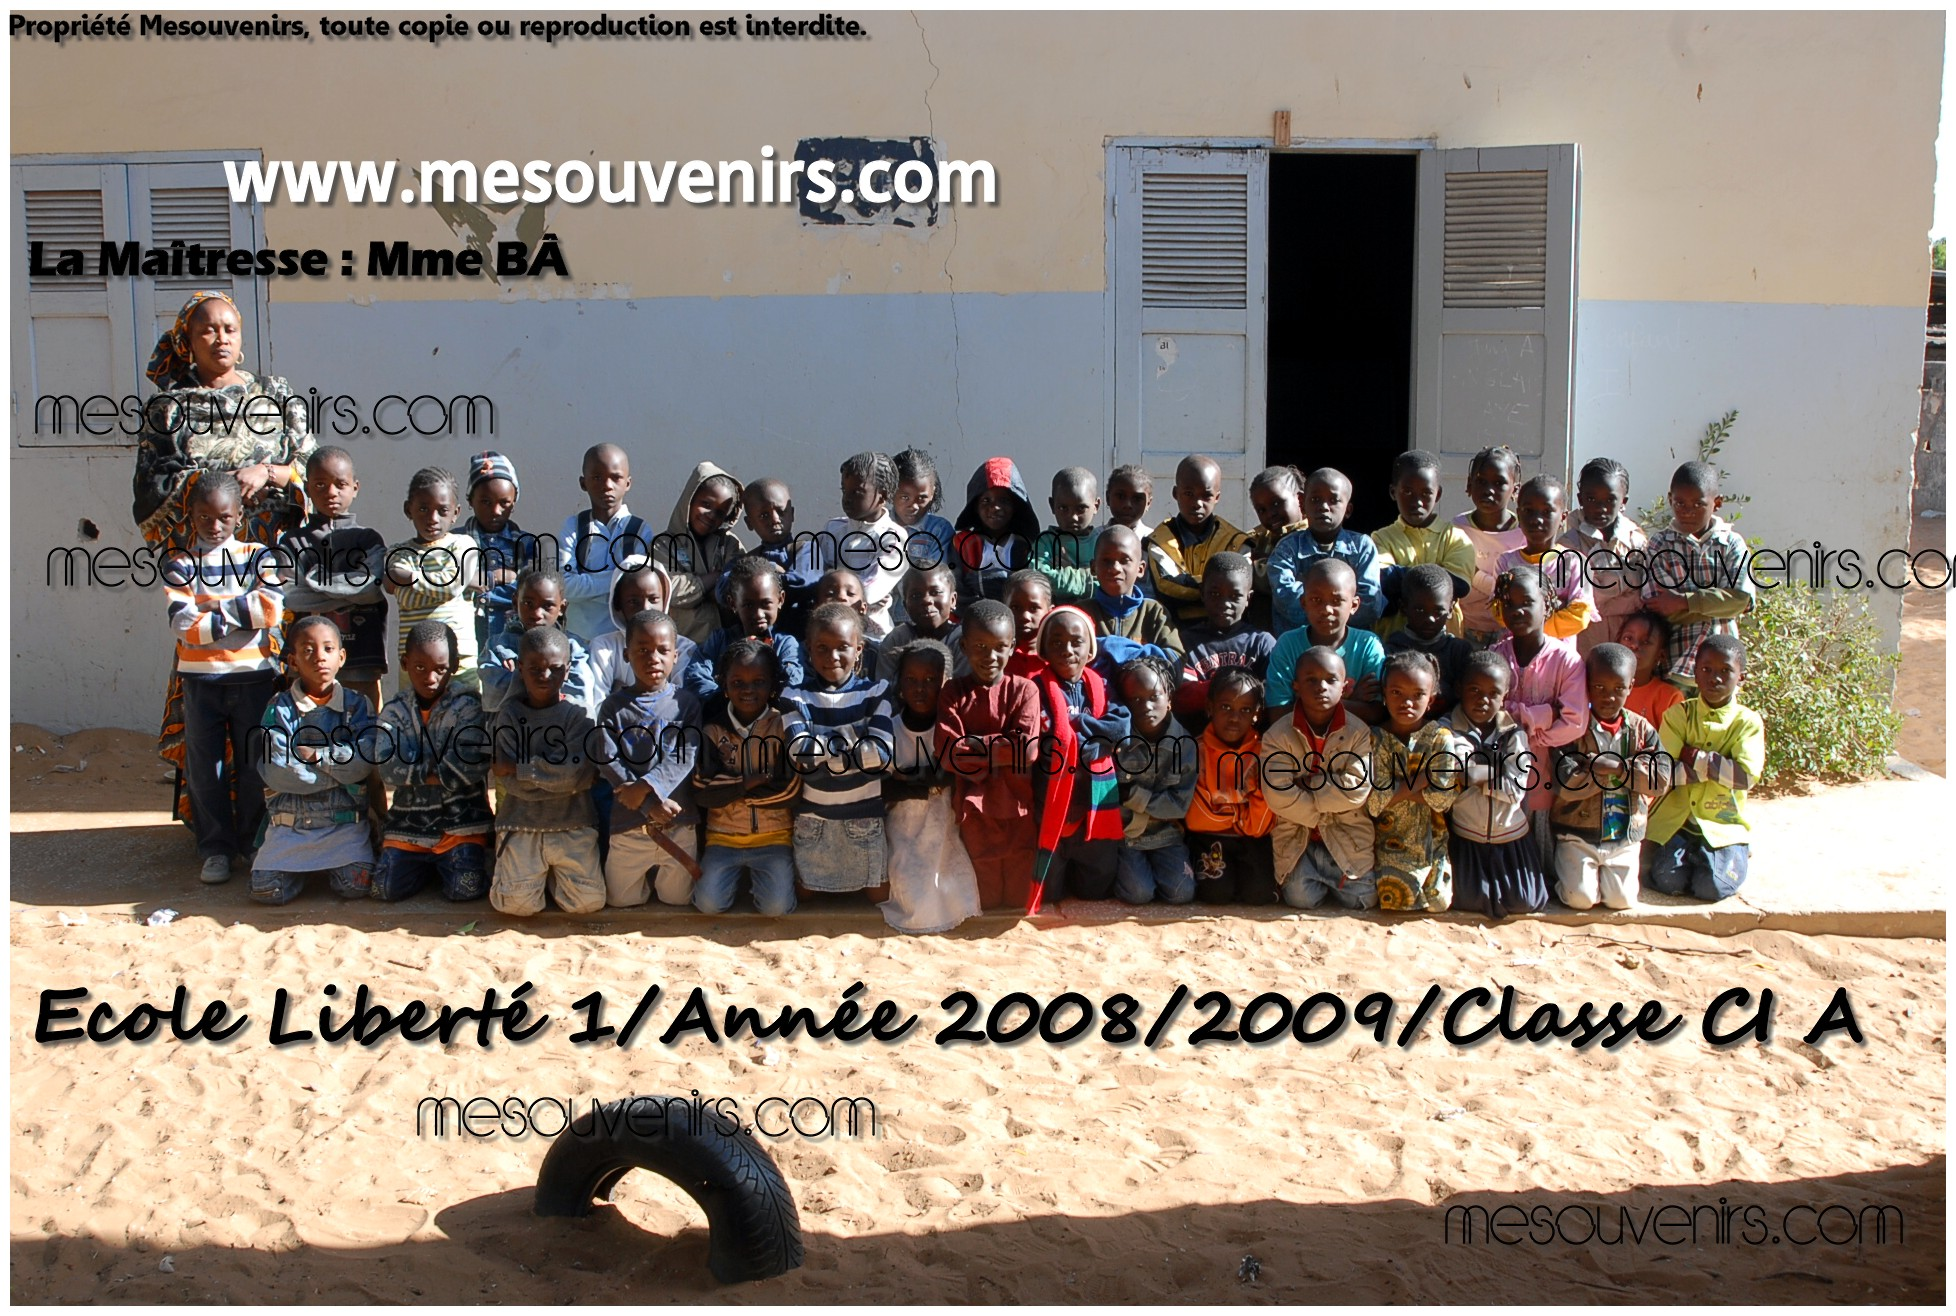 Ecole Liberté 1  2008 2009 CI A